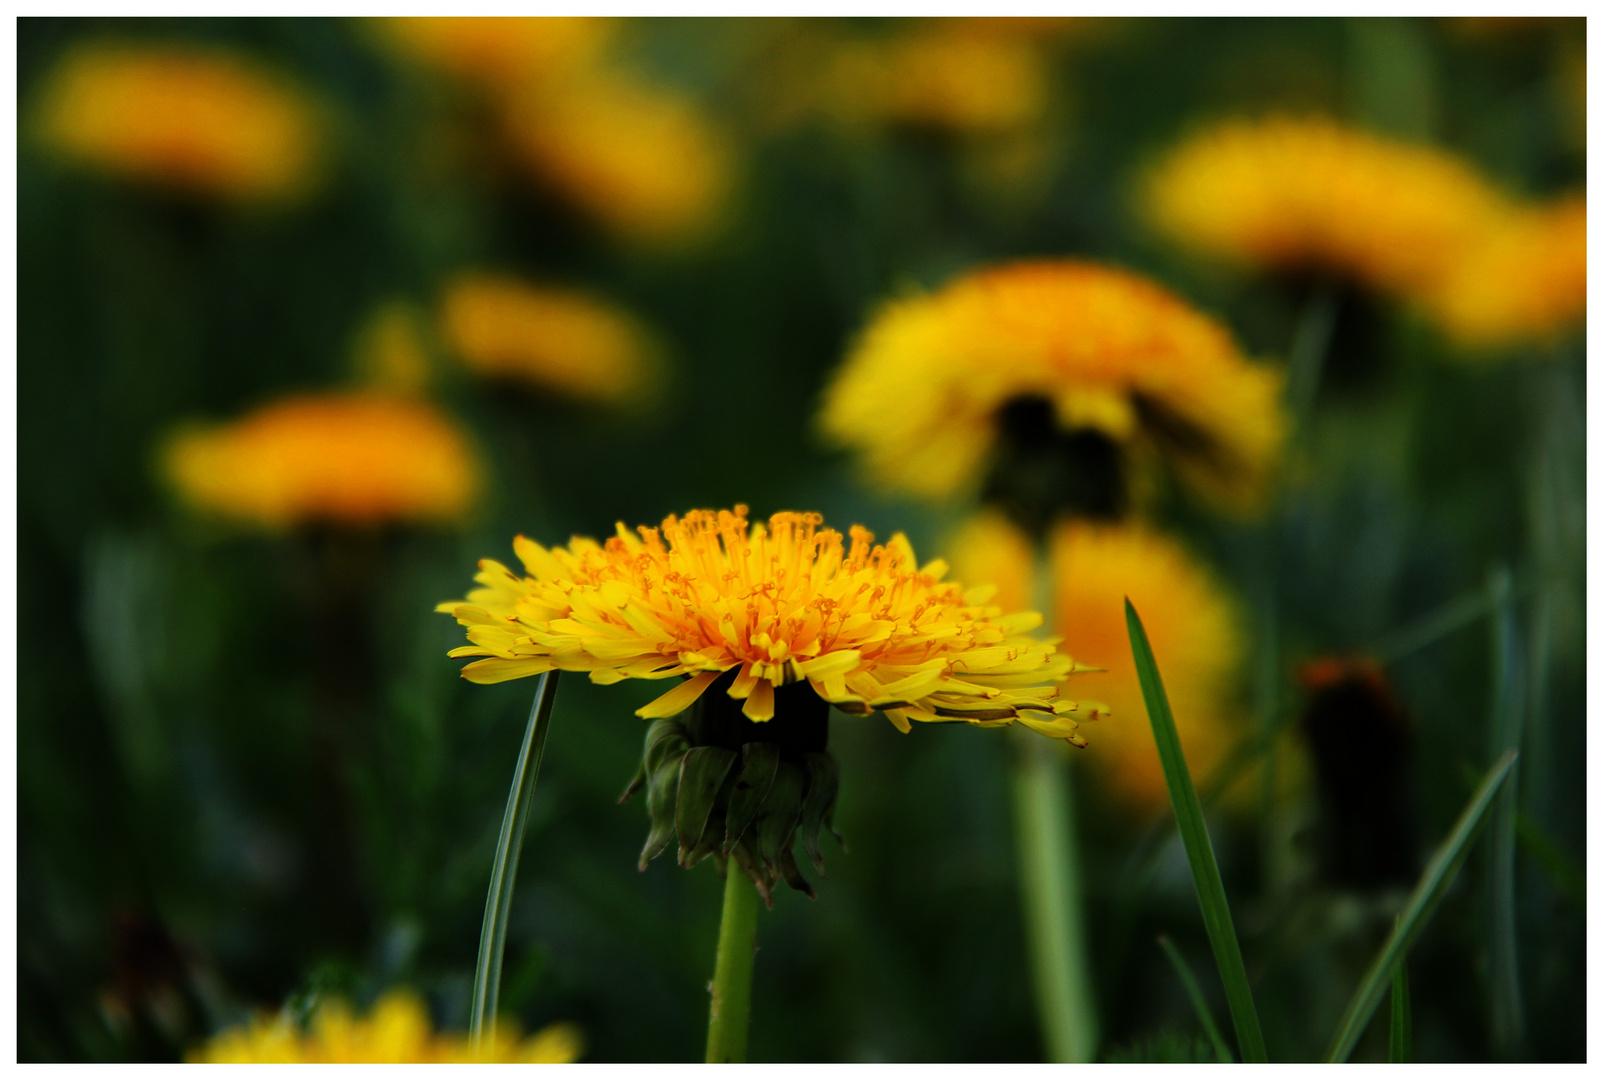 Dicke gelbe Butterblume bald bist du ne Pusteblume!